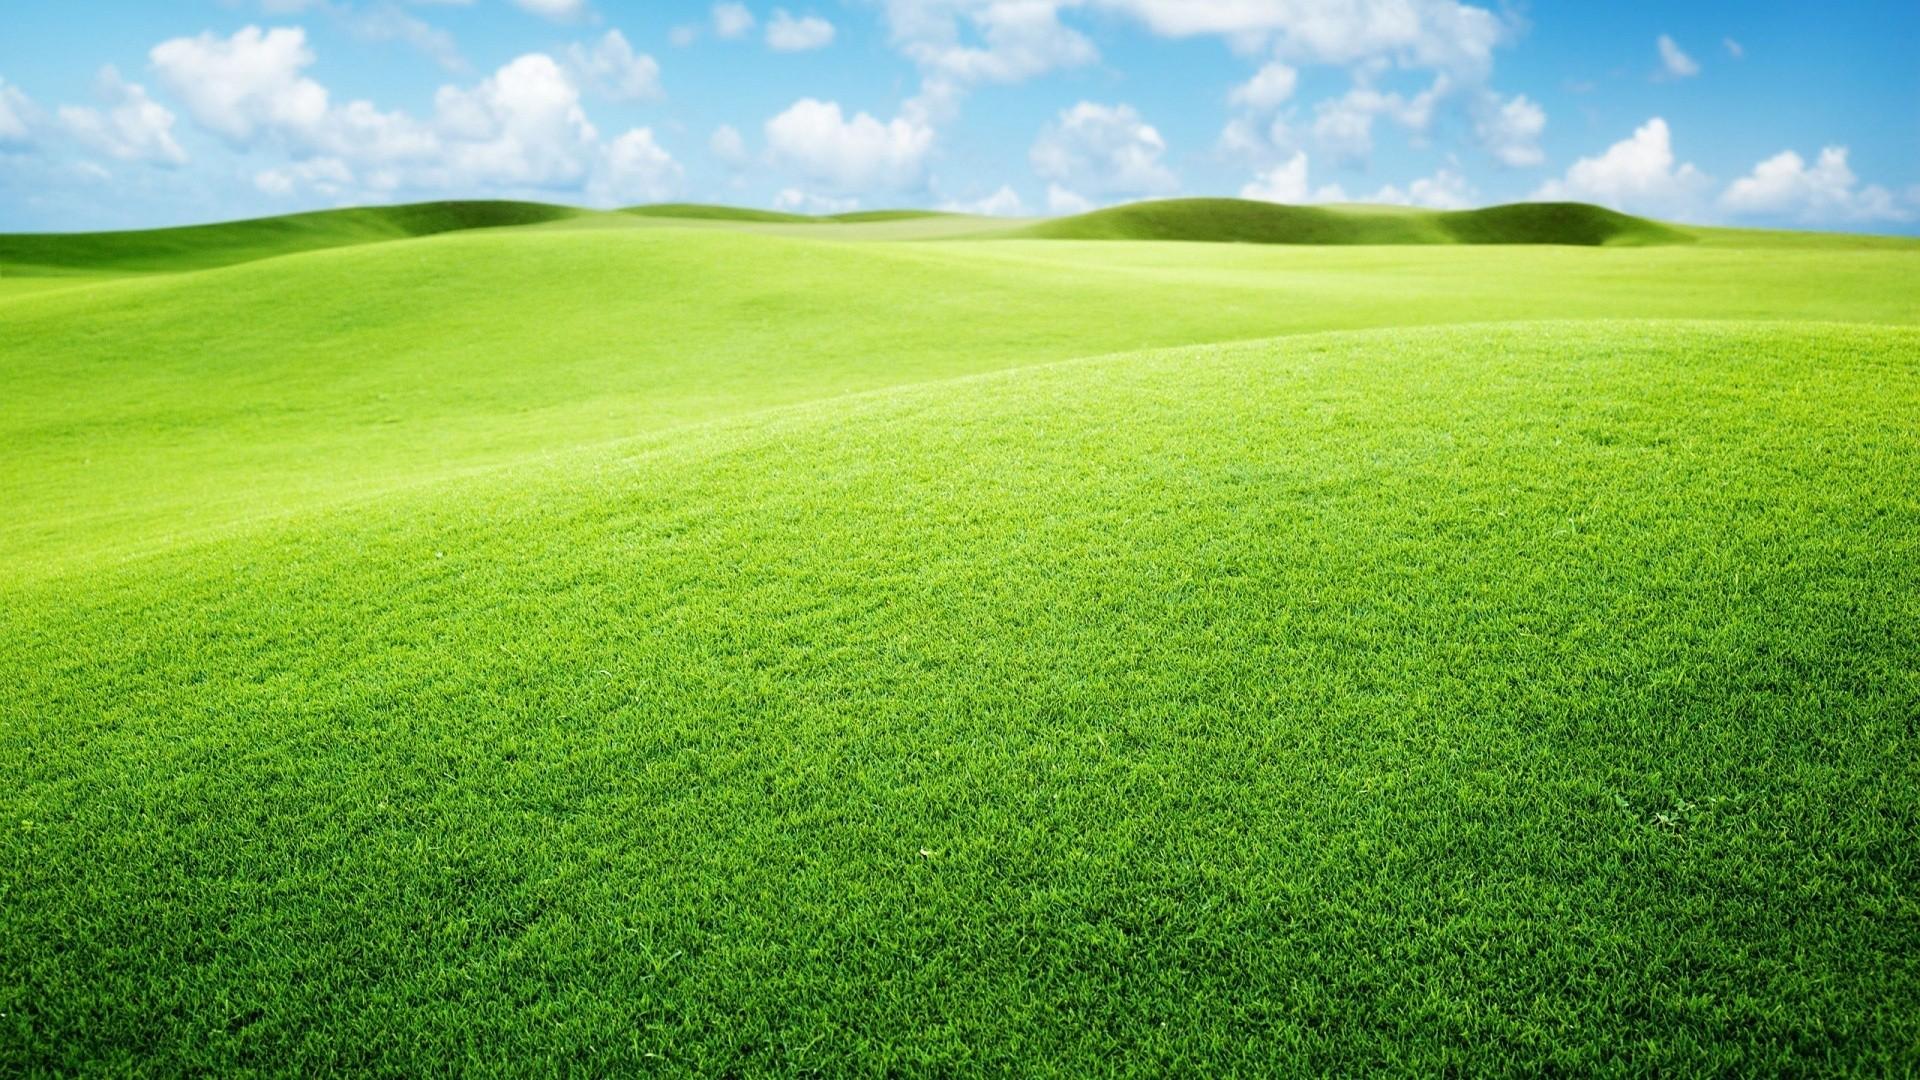 Seagrass Wallpaper image hd